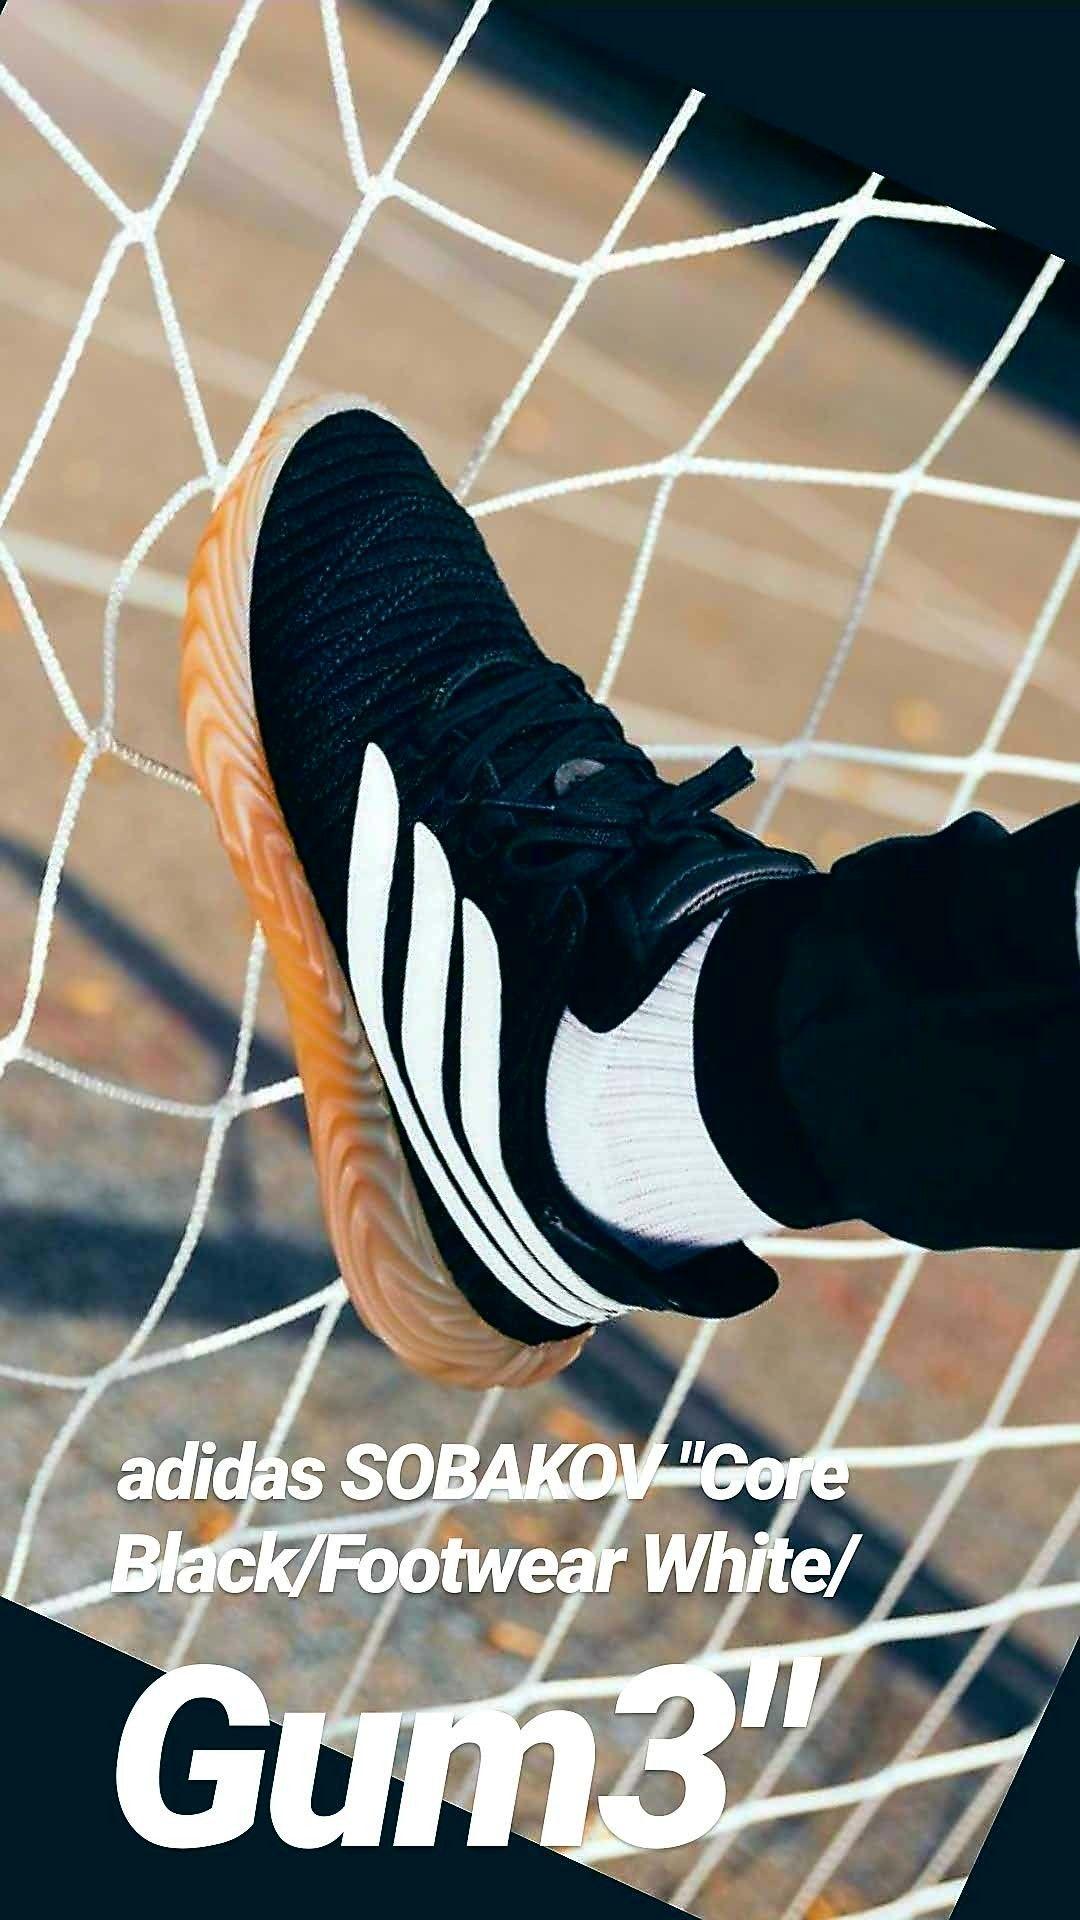 ba06d91aed60 Adidas Sobakov Core Black Footwear White Gum 3.